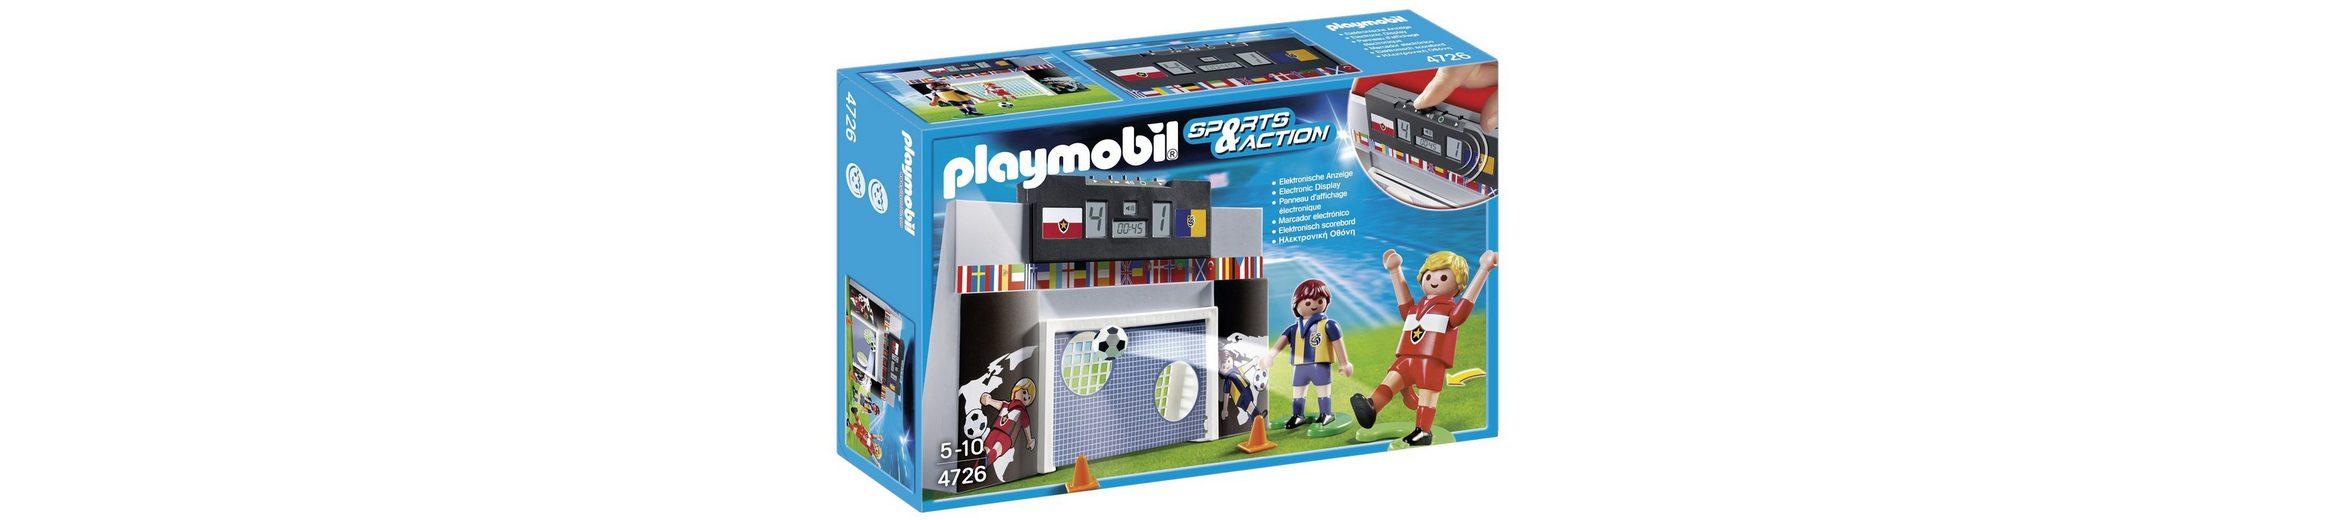 Playmobil® Torwand mit Multifunktions-Anzeige (4726), Sports & Action